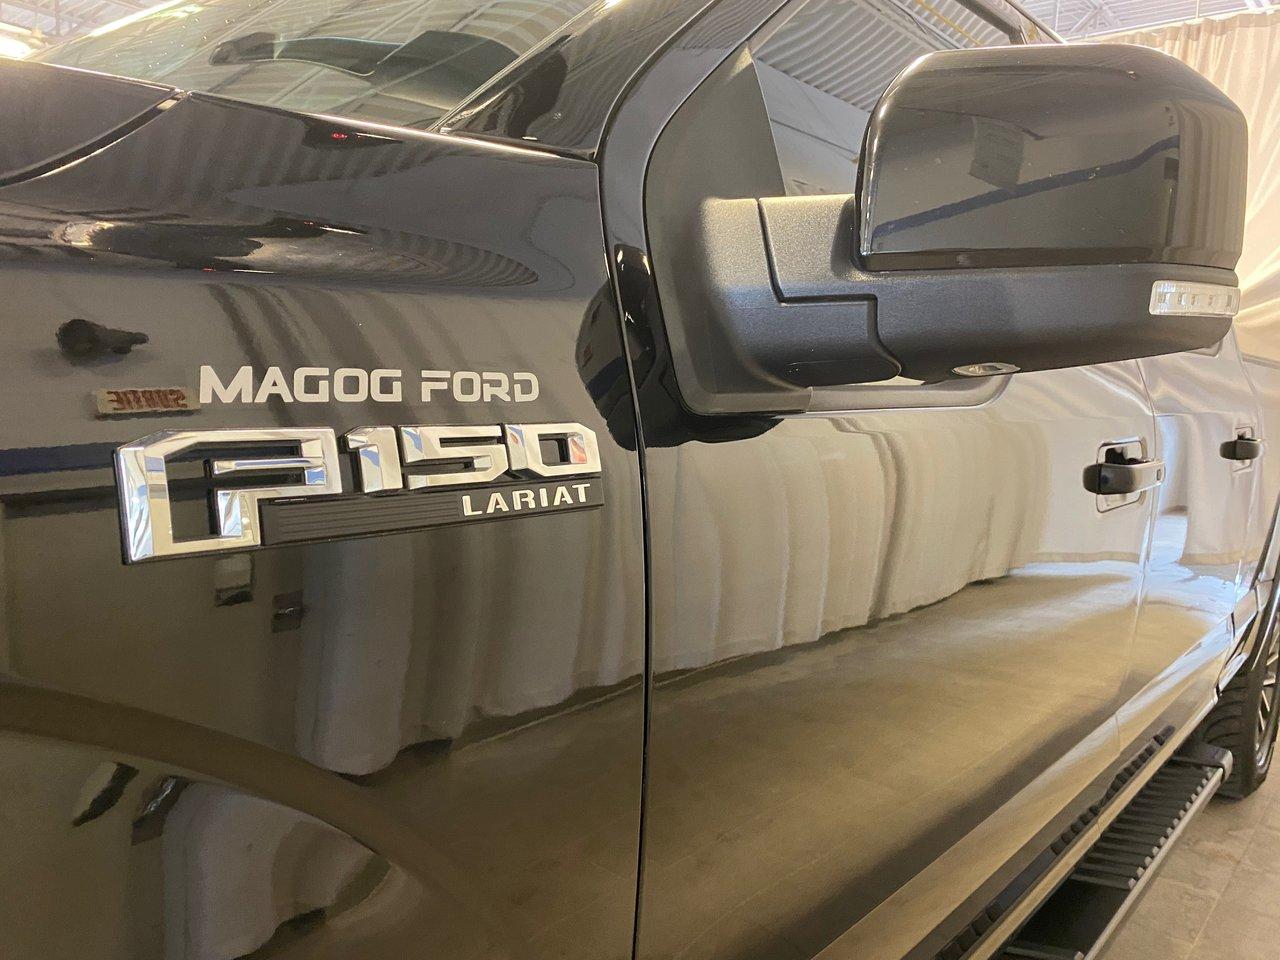 2018 Ford F-150 LARIAT 5.0L V8 501A BOITE 6.5 NAVI + CUIR